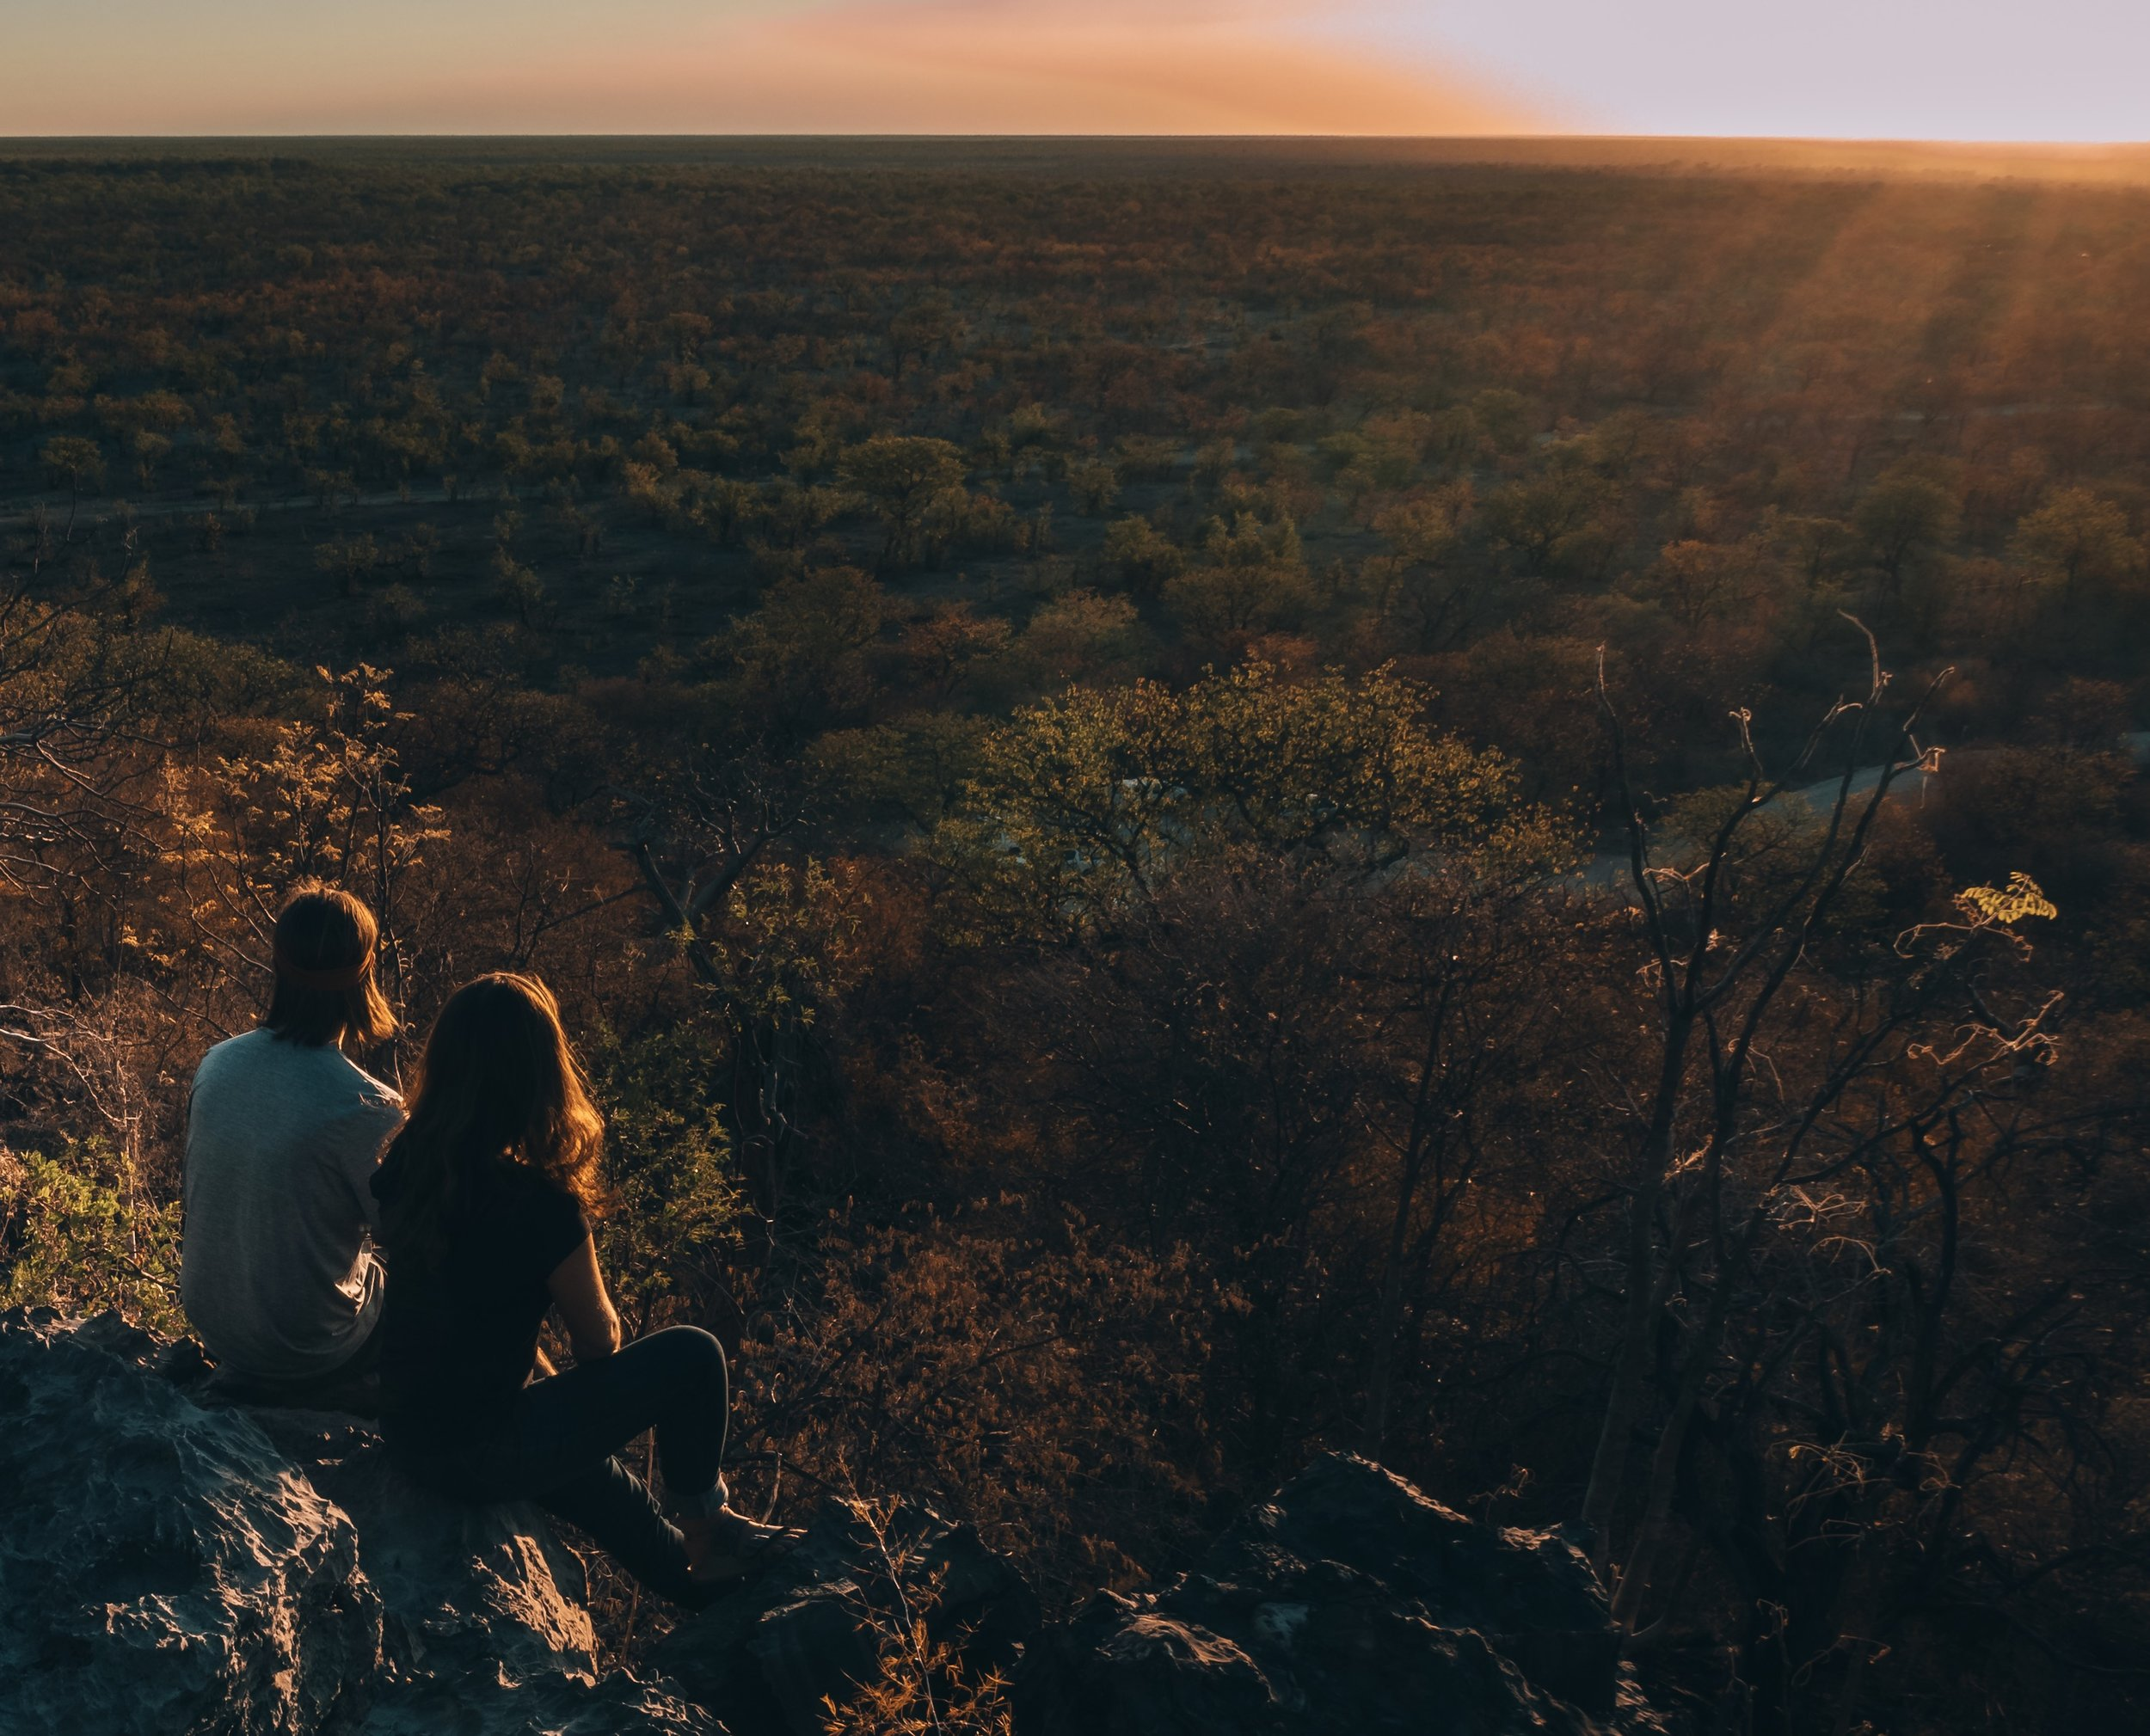 Watching sunset from the hill at Halali camp, Etosha